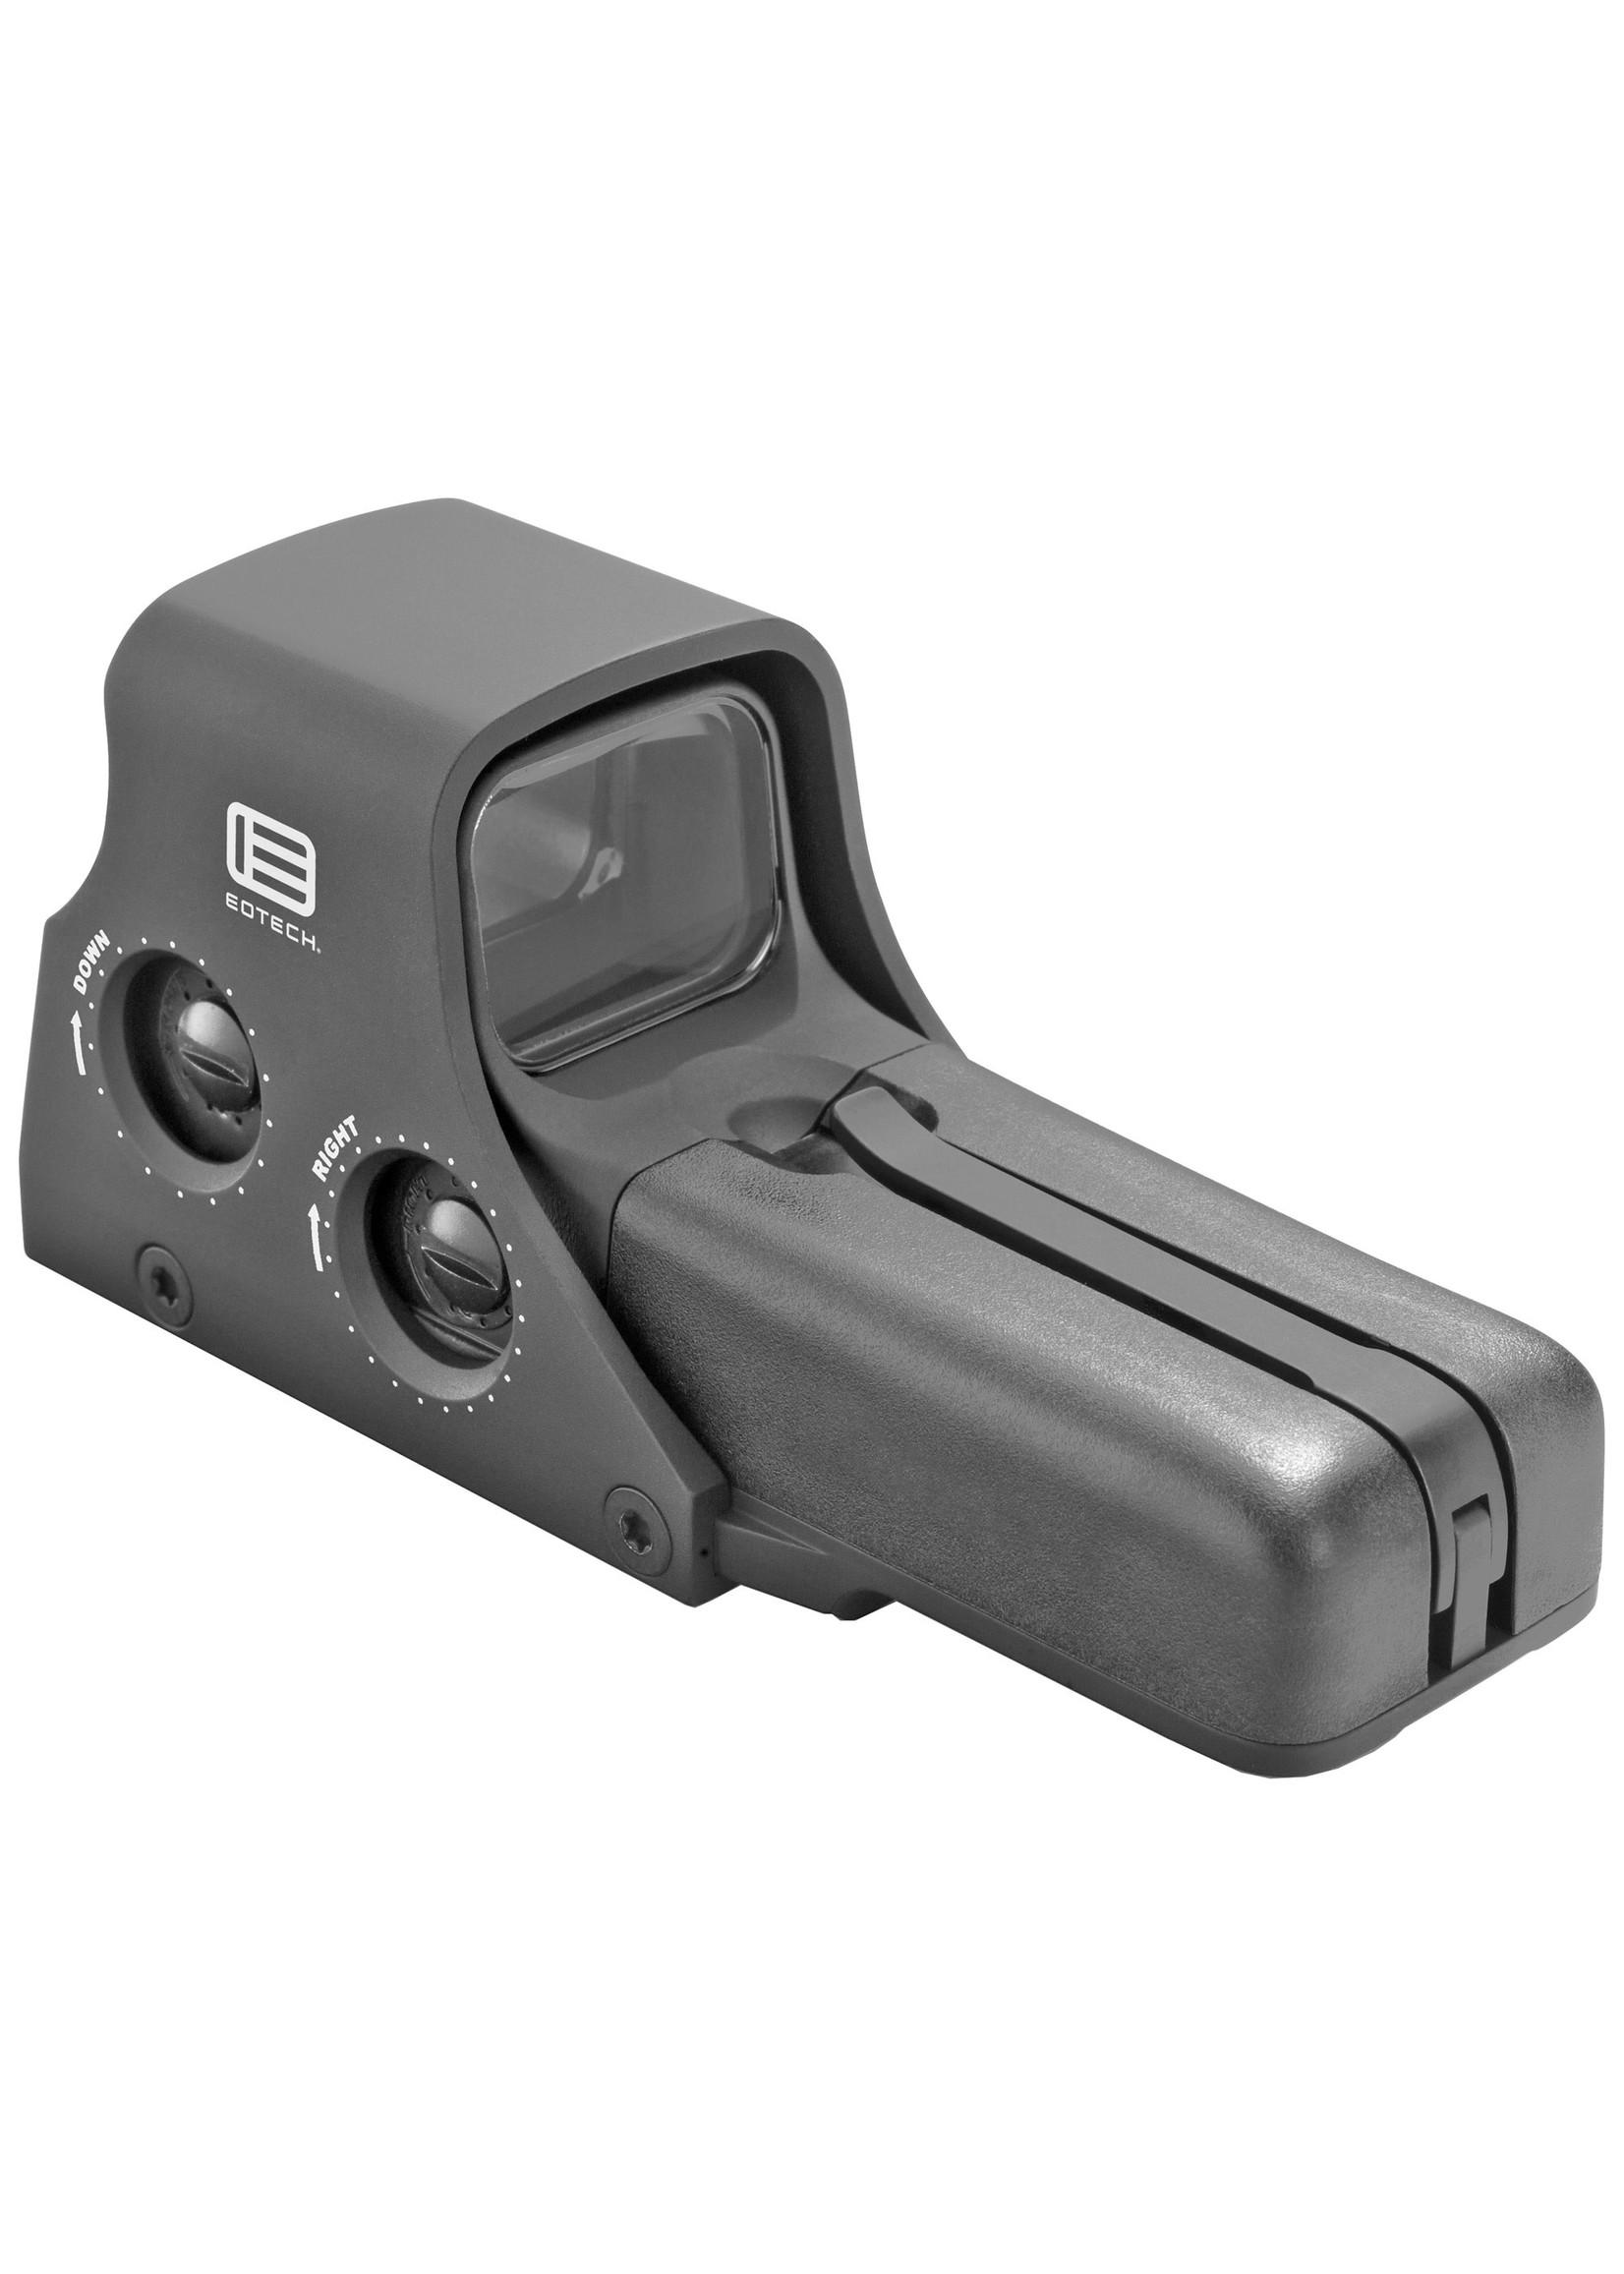 EO Tech EO Tech Model 512 AA-Battery Holographic Sight